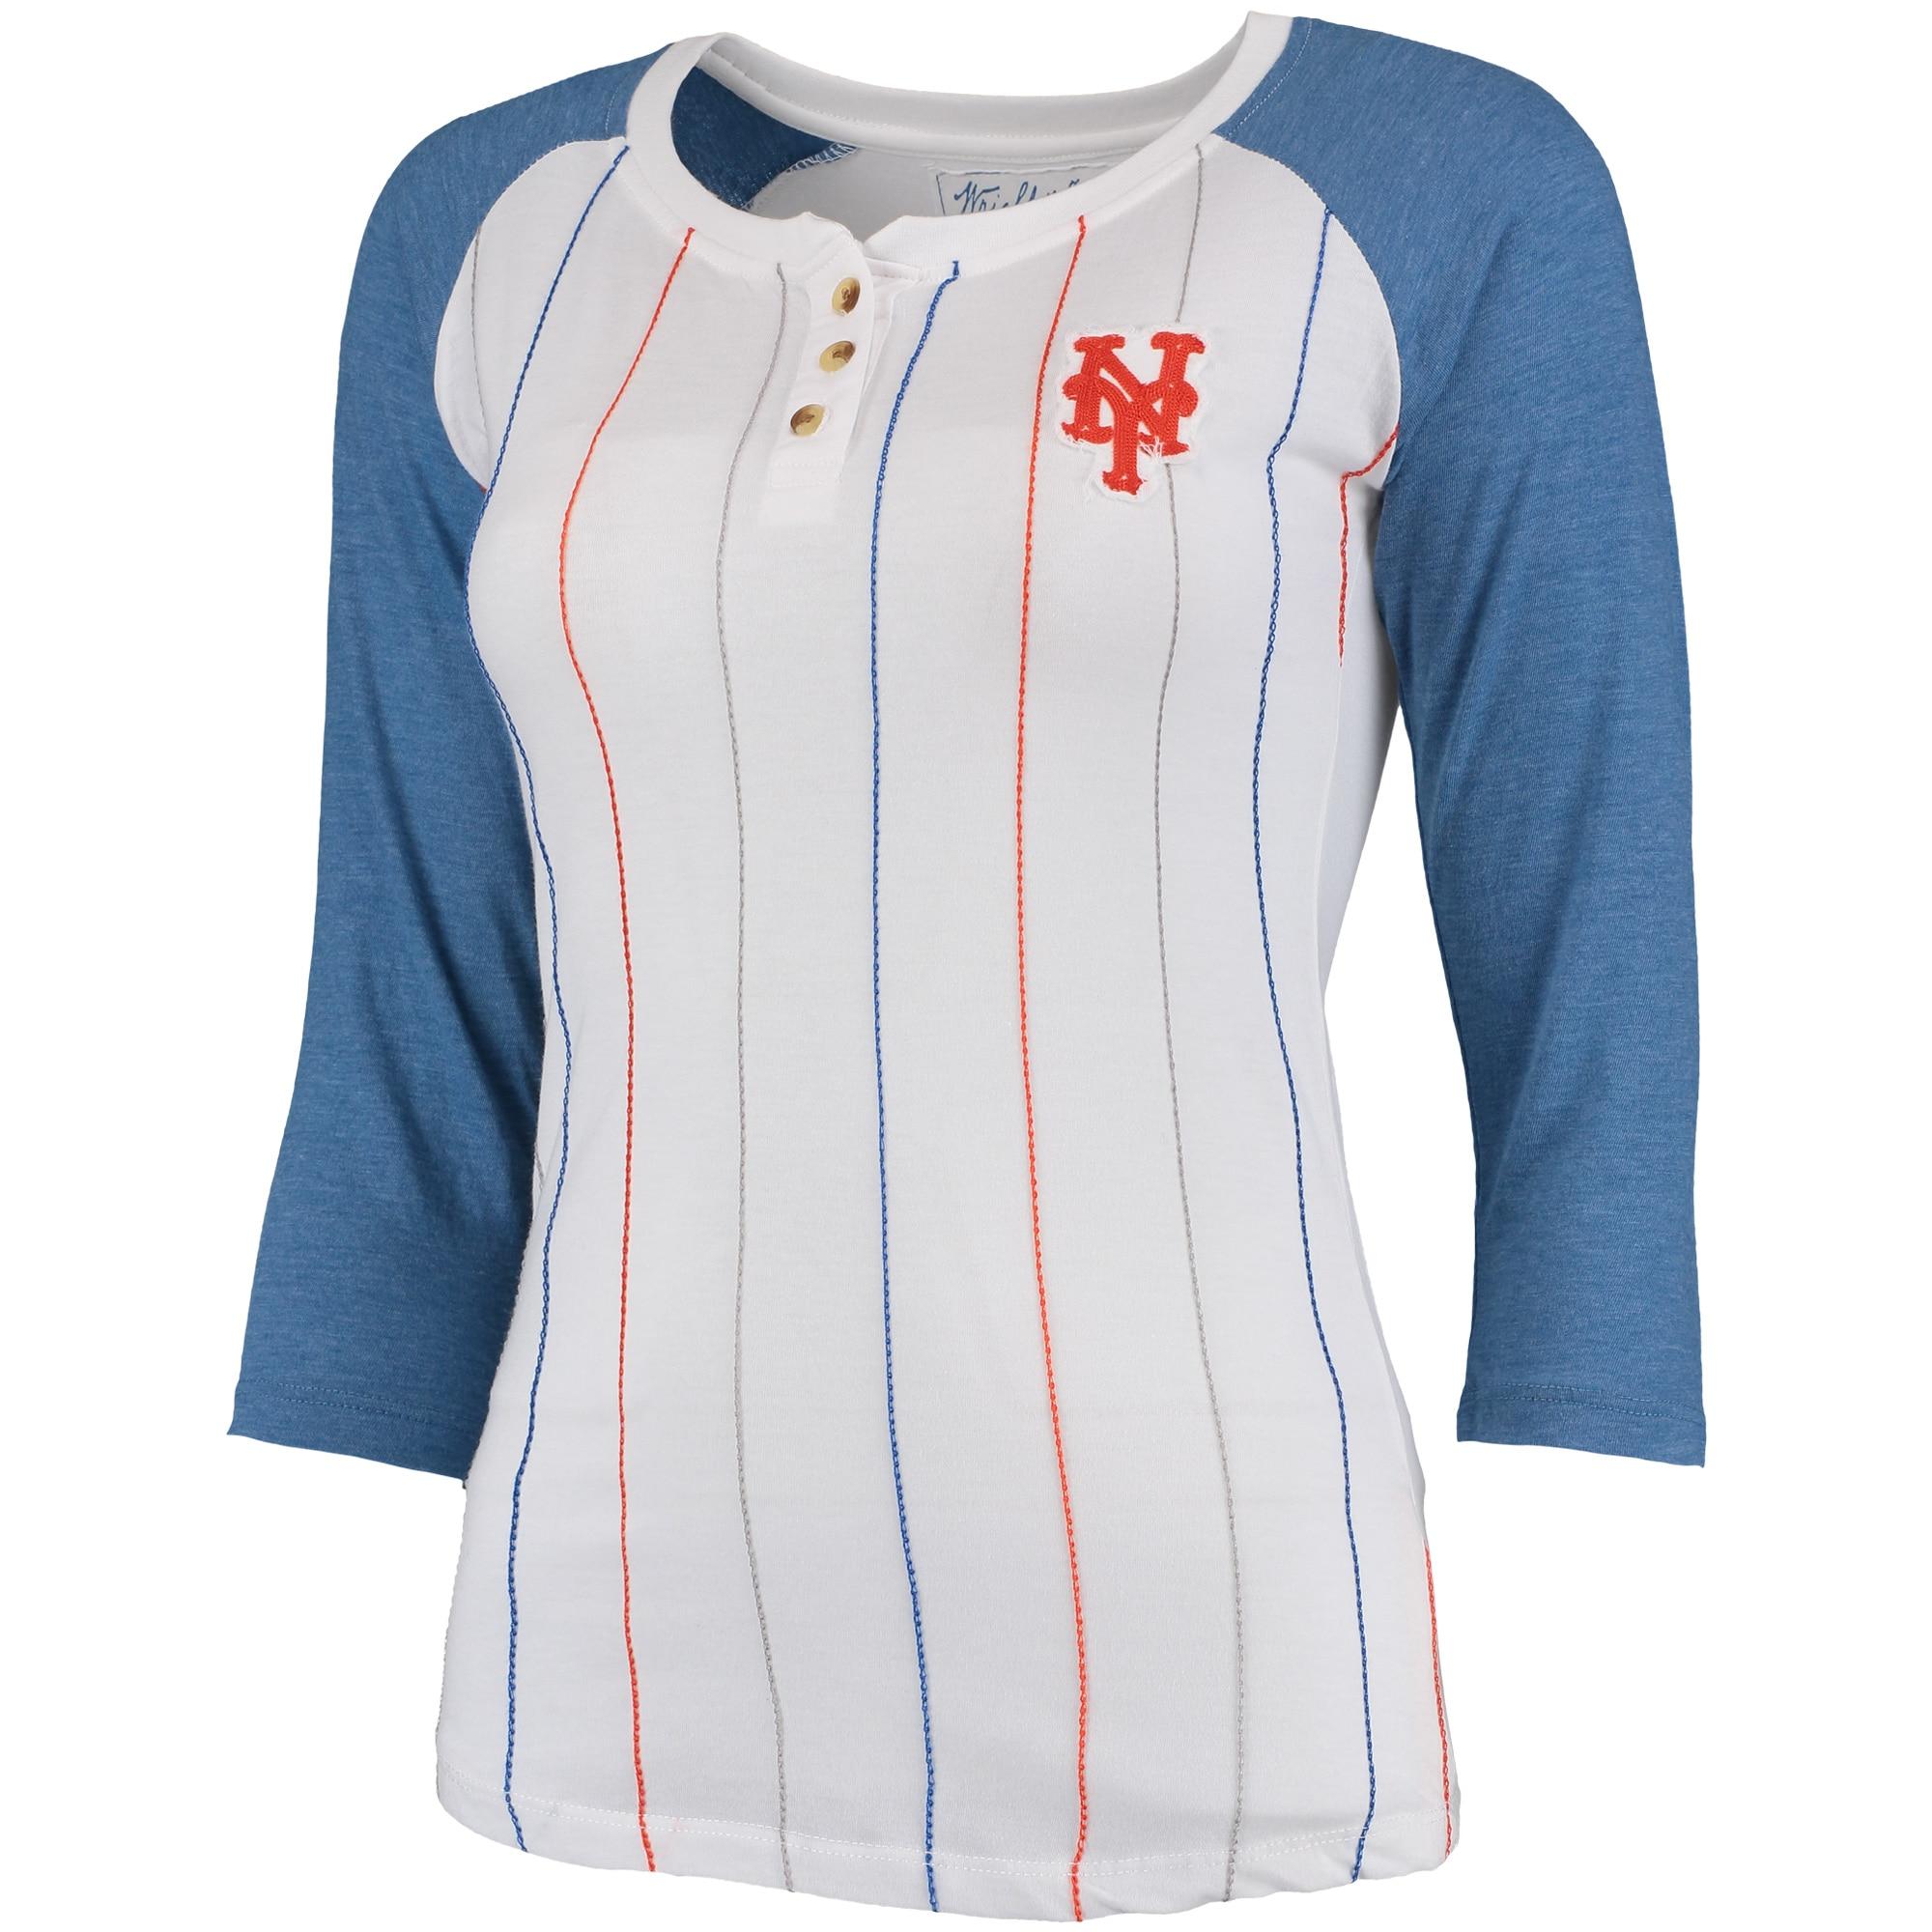 New York Mets Wright & Ditson Women's Lockhart 3/4-Sleeve Raglan Pinstripe T-Shirt - White/Royal